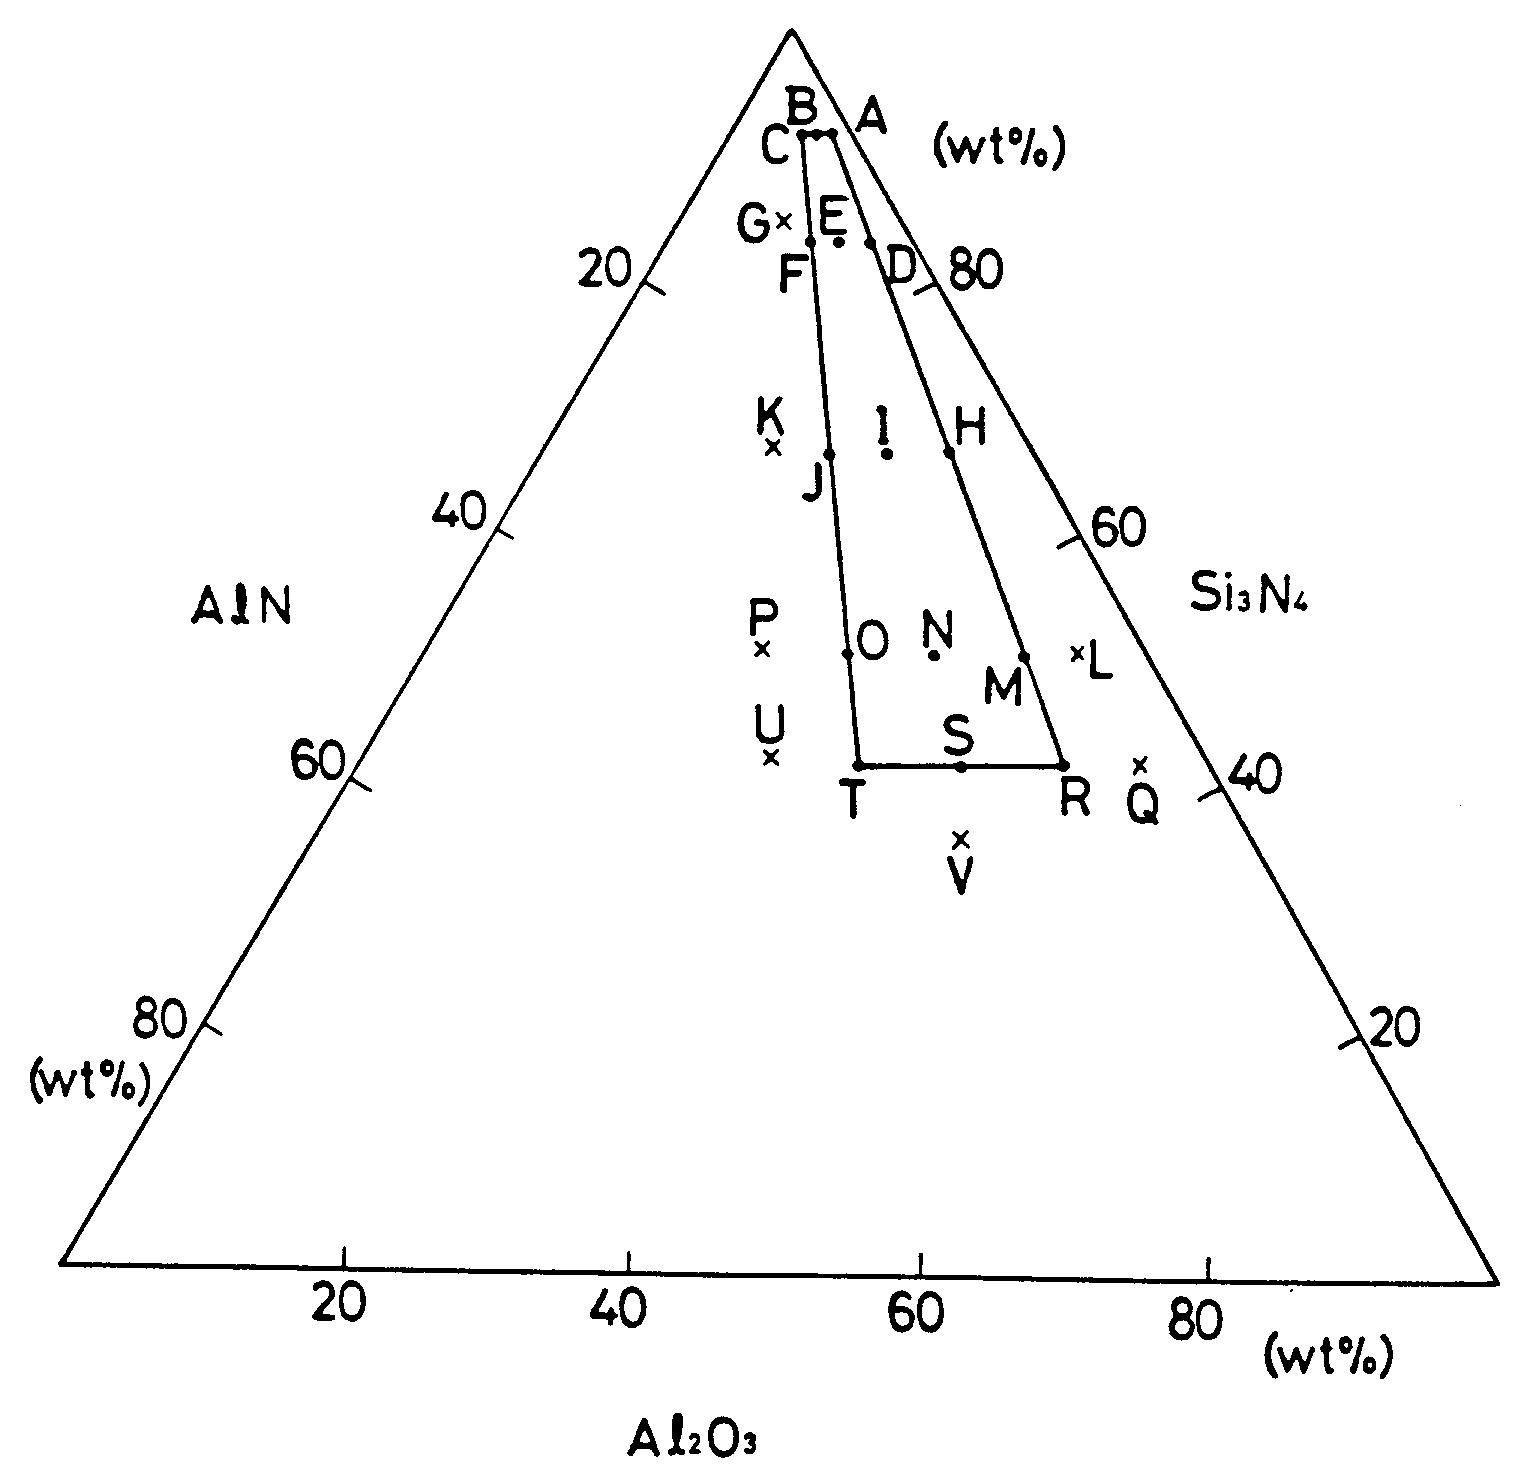 hight resolution of figure imgb0004